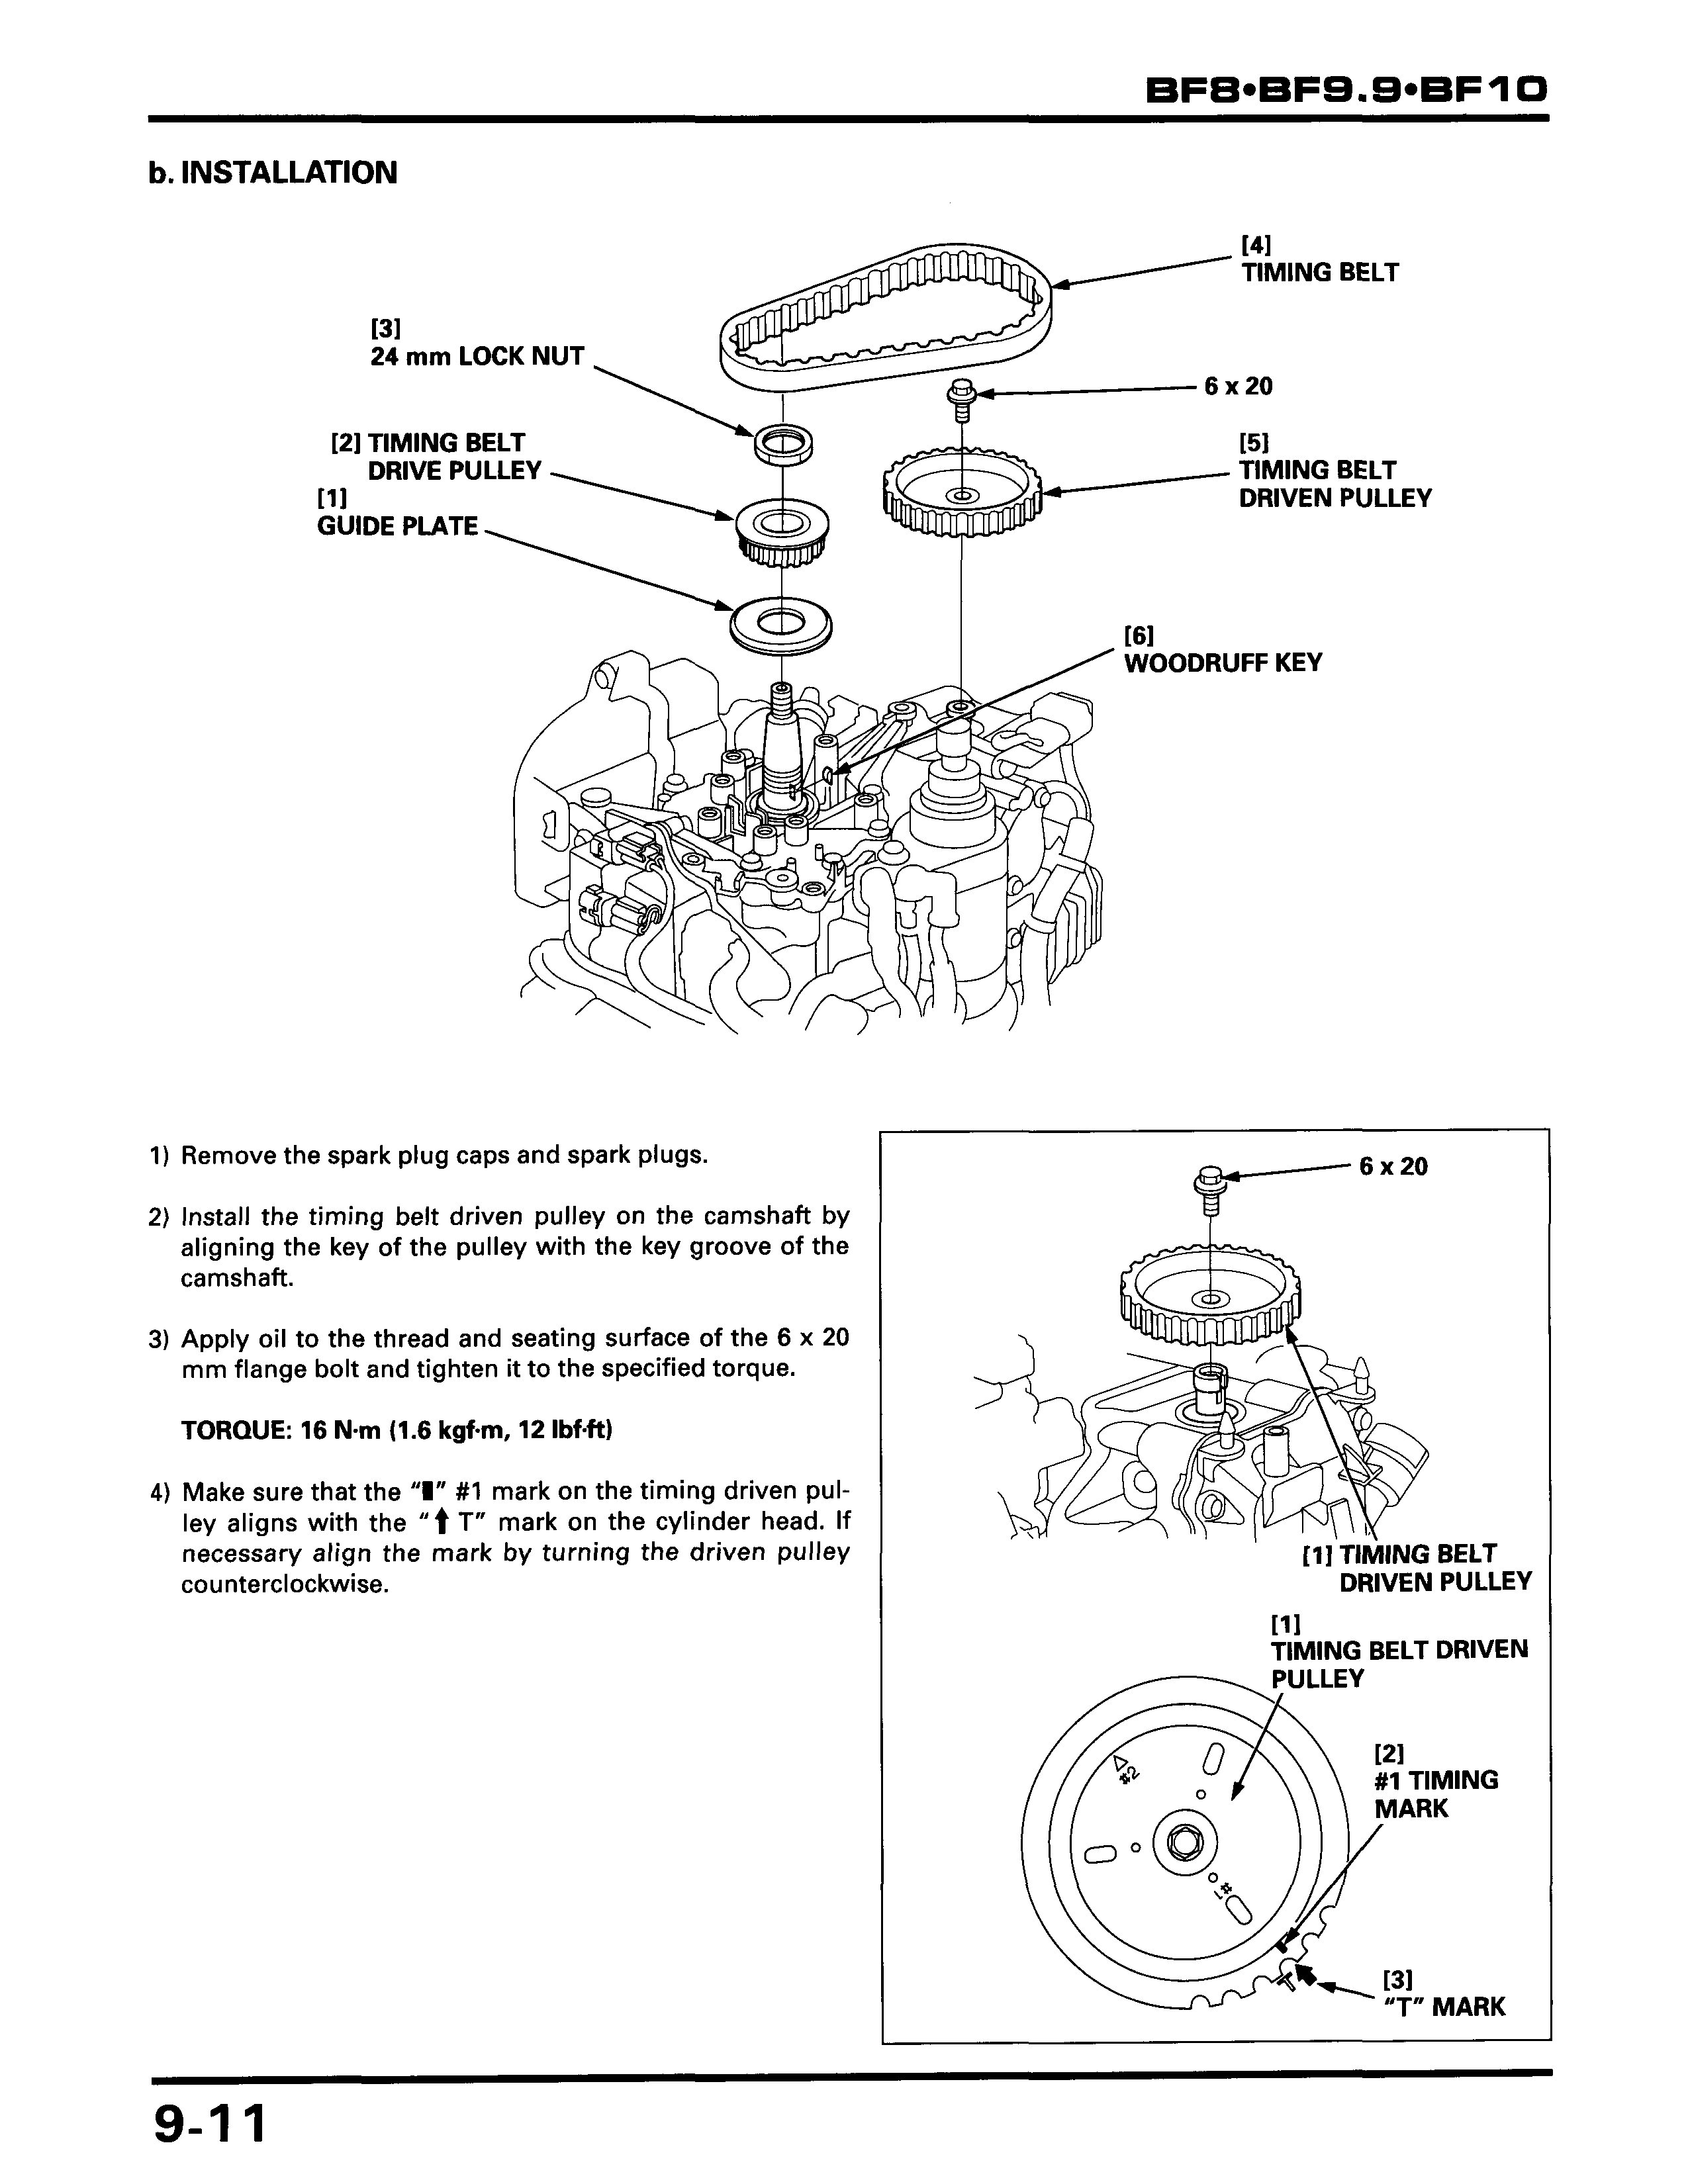 Honda bf8a 8hp 4 stroke set timing bzbc1800392